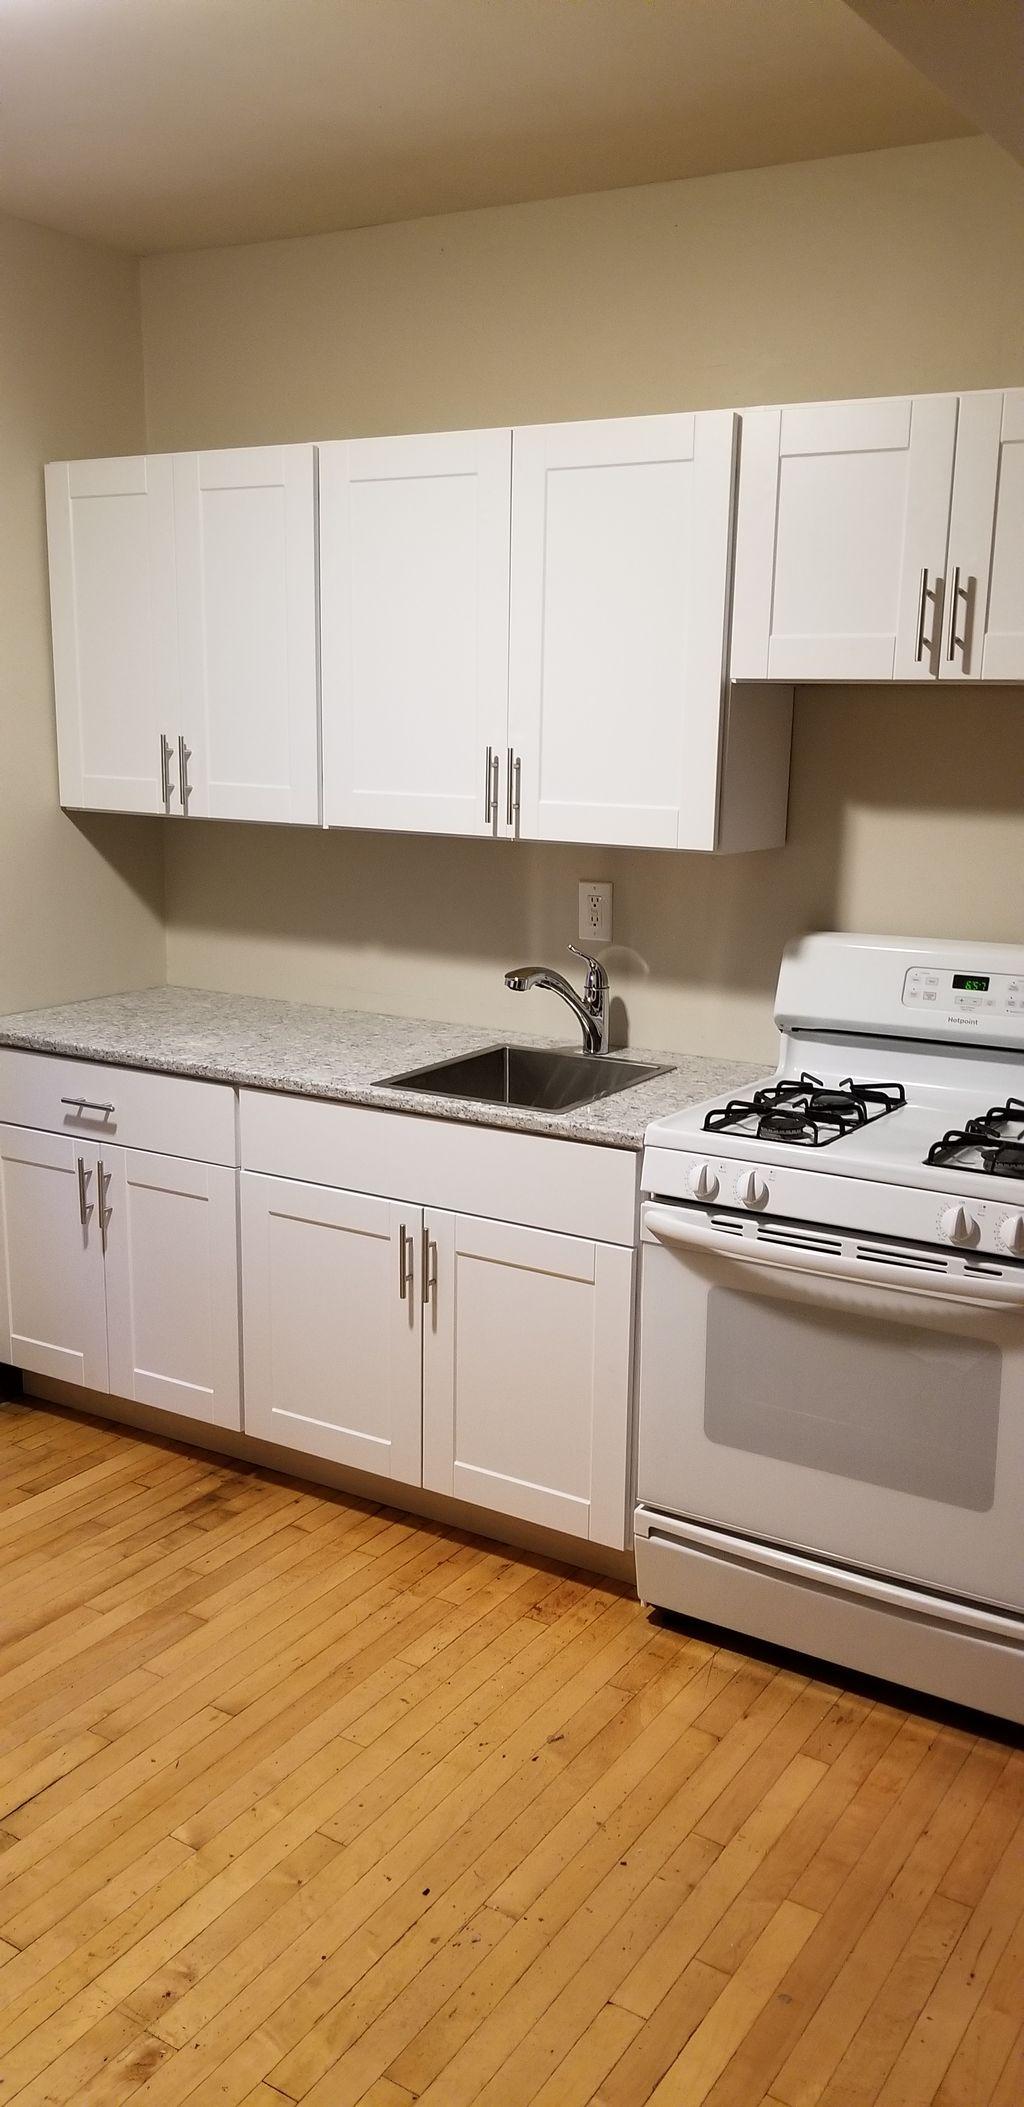 Rental apartment budget kitchen